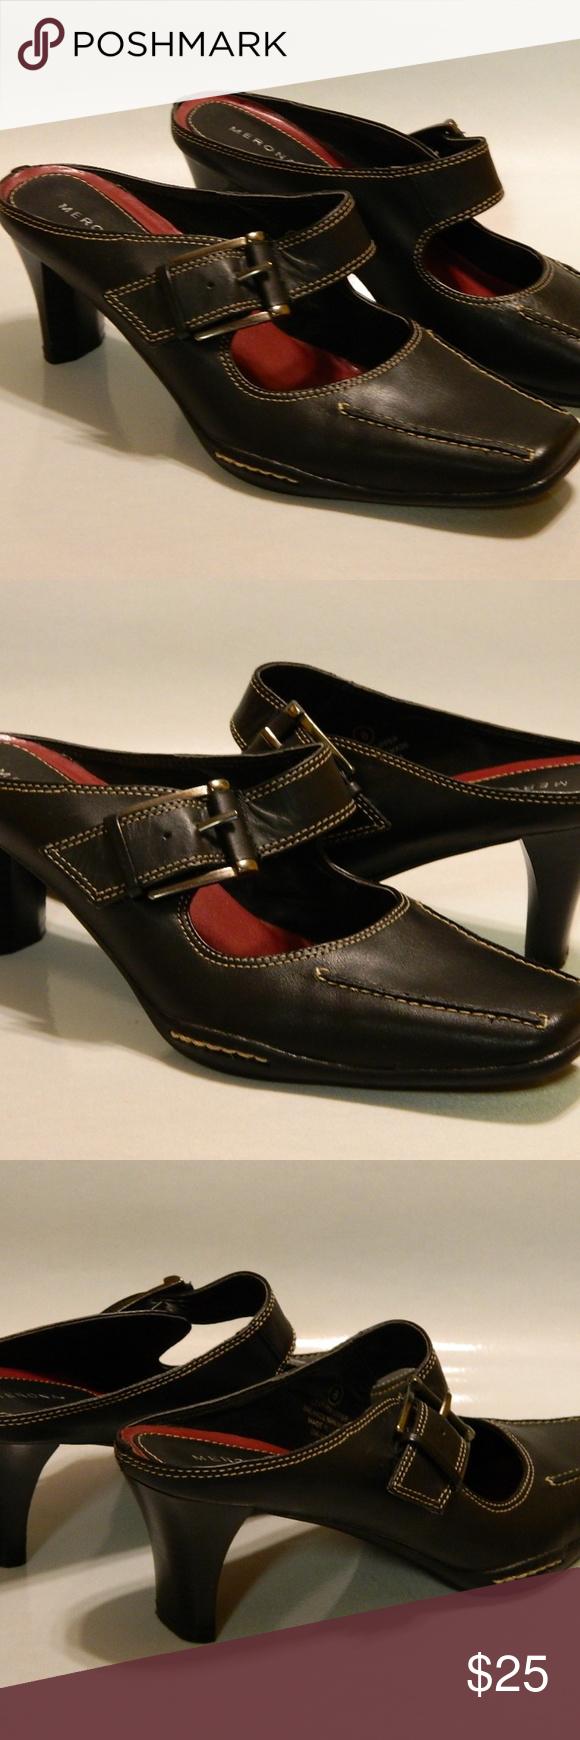 e970f83f8fa MERONA Mary Jane Mules Shoe Leather Black Sz 8 EUC MERONA Women s Mules  Mary Jane Slides